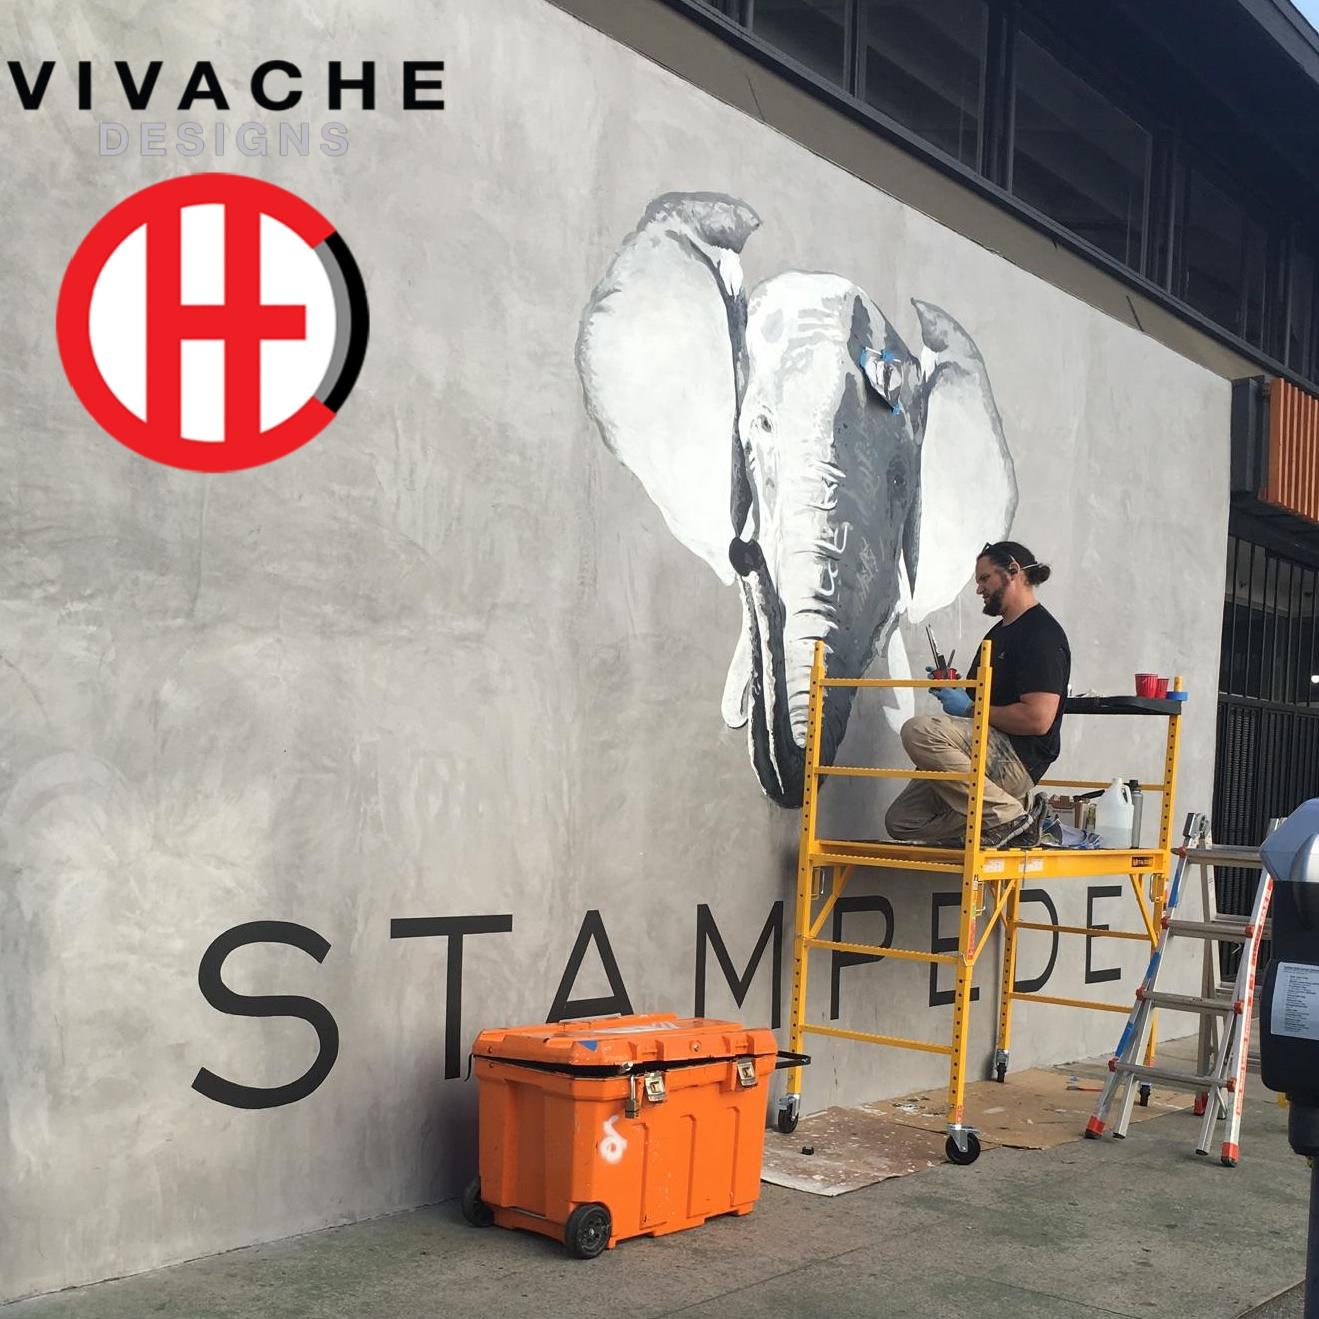 Mural Painter Vivache Designs Custom Mural Painting